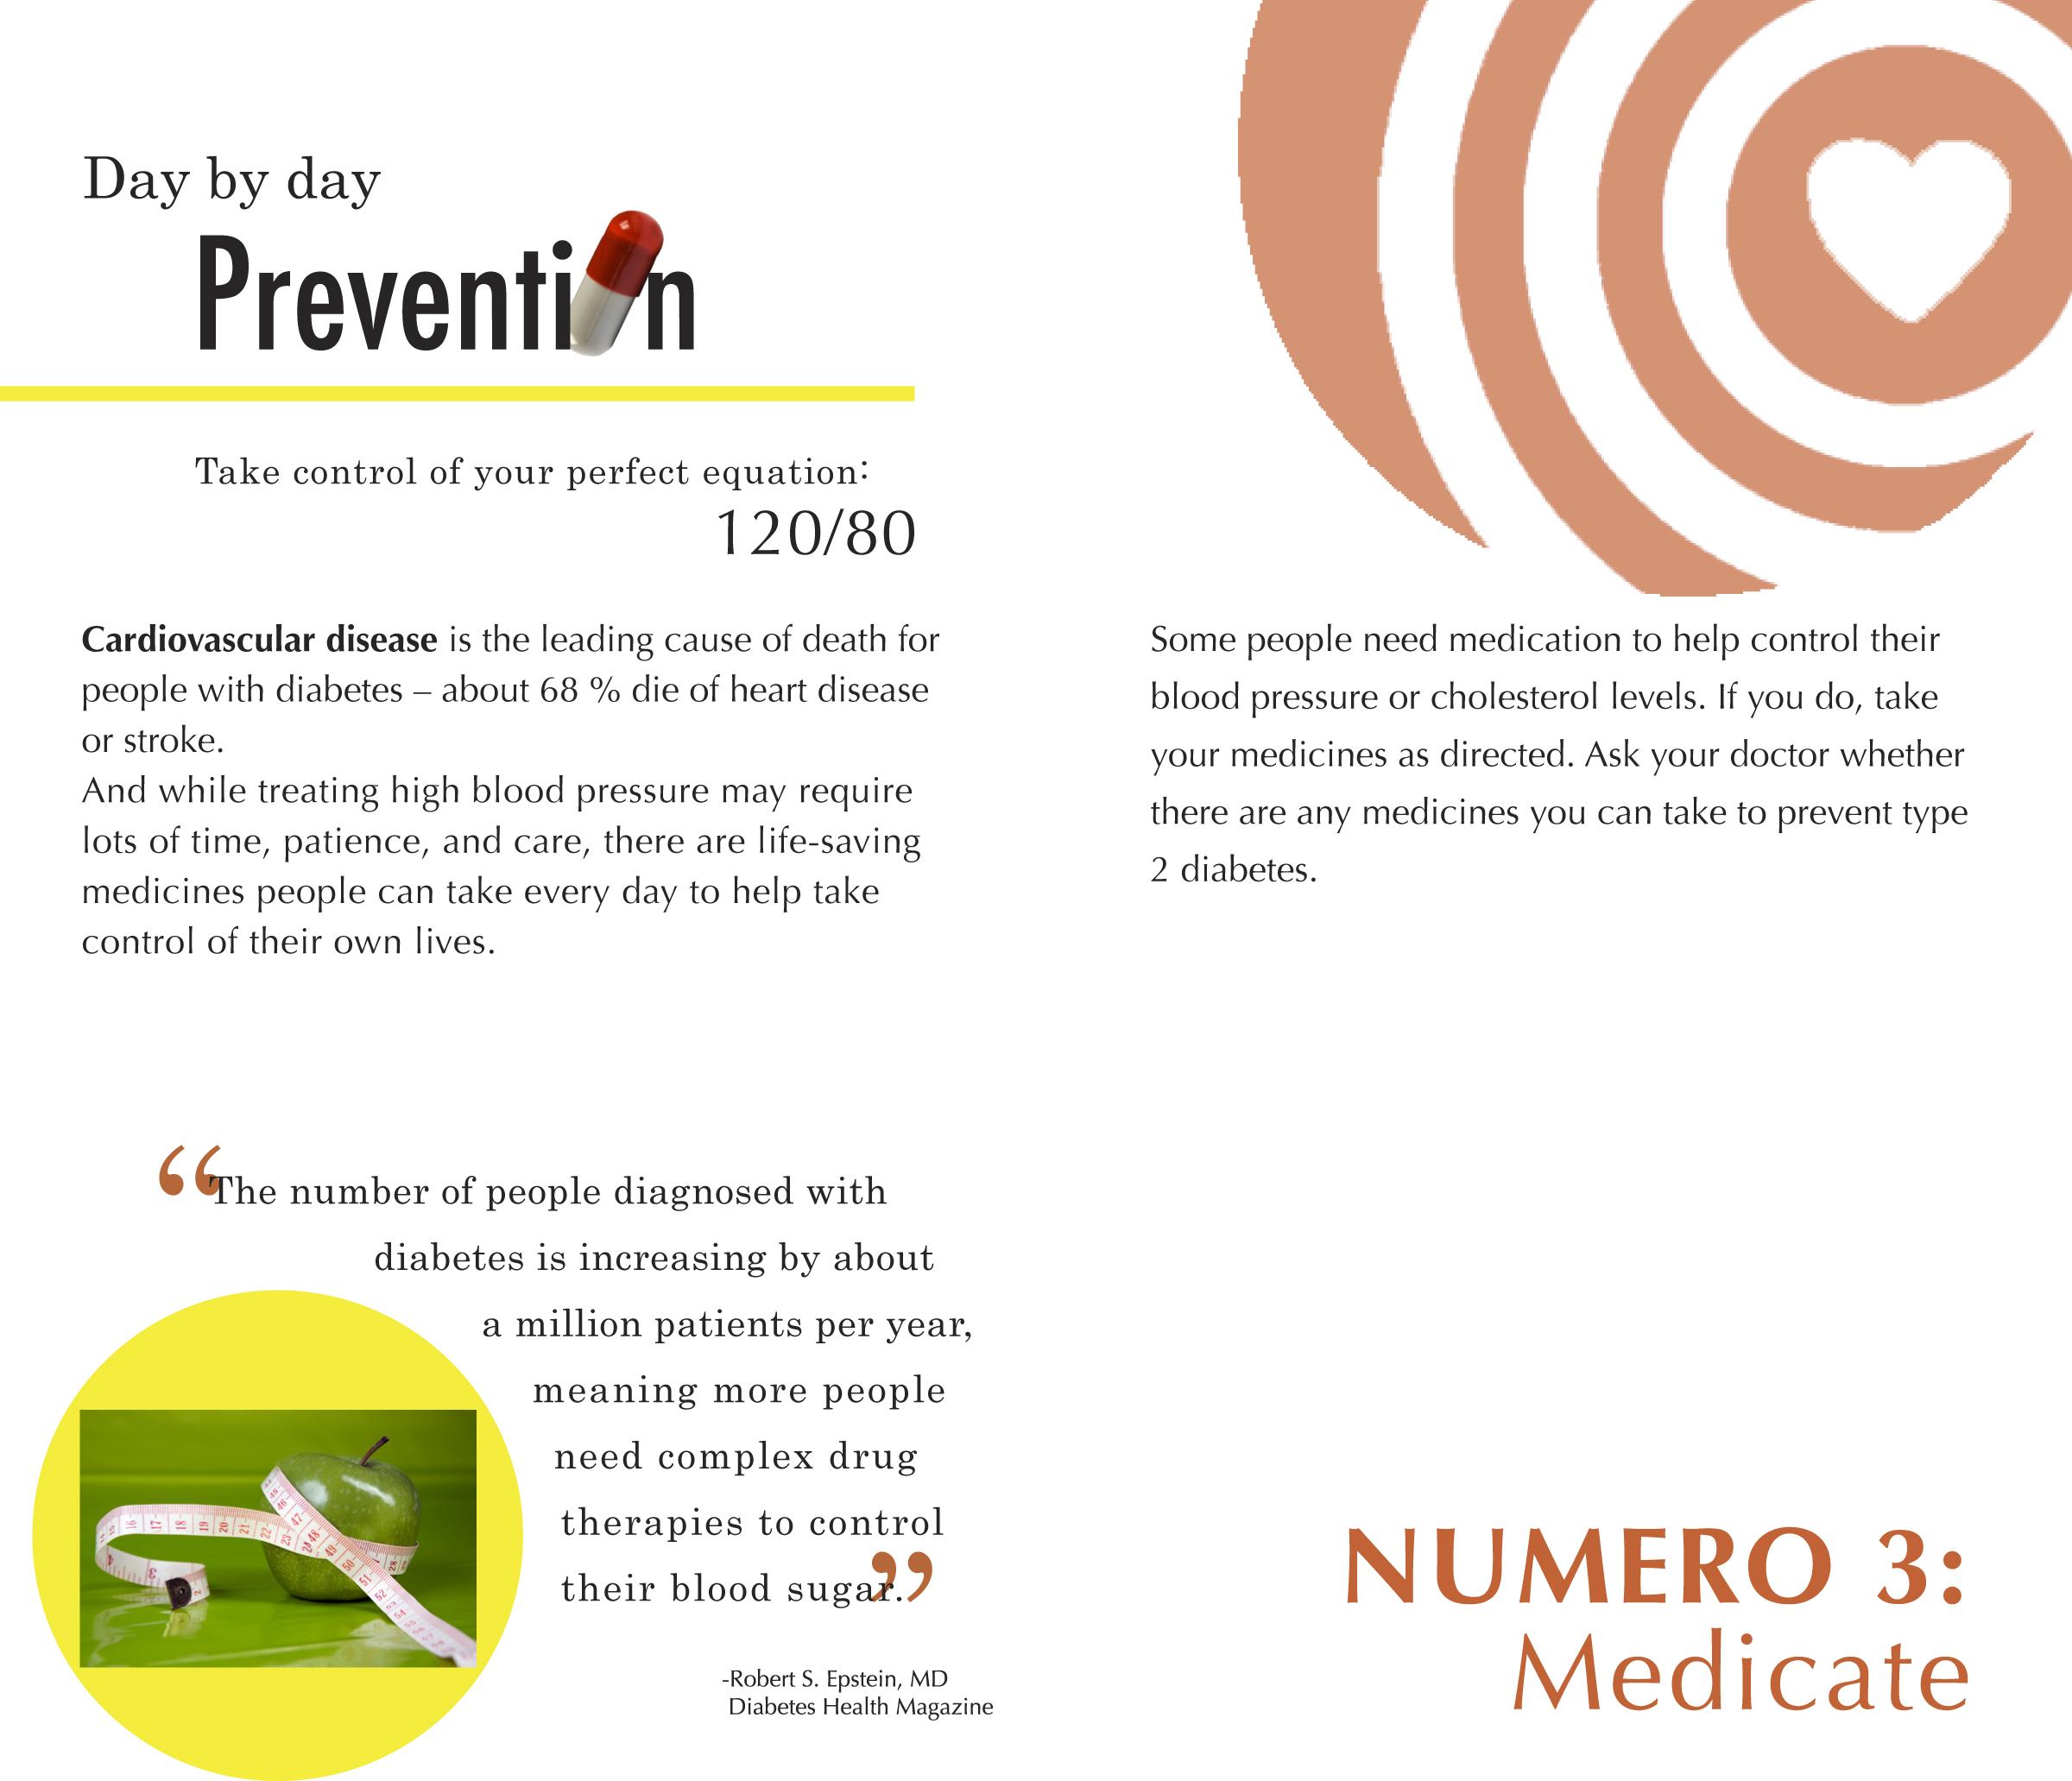 2medicatebrochure-2.jpg